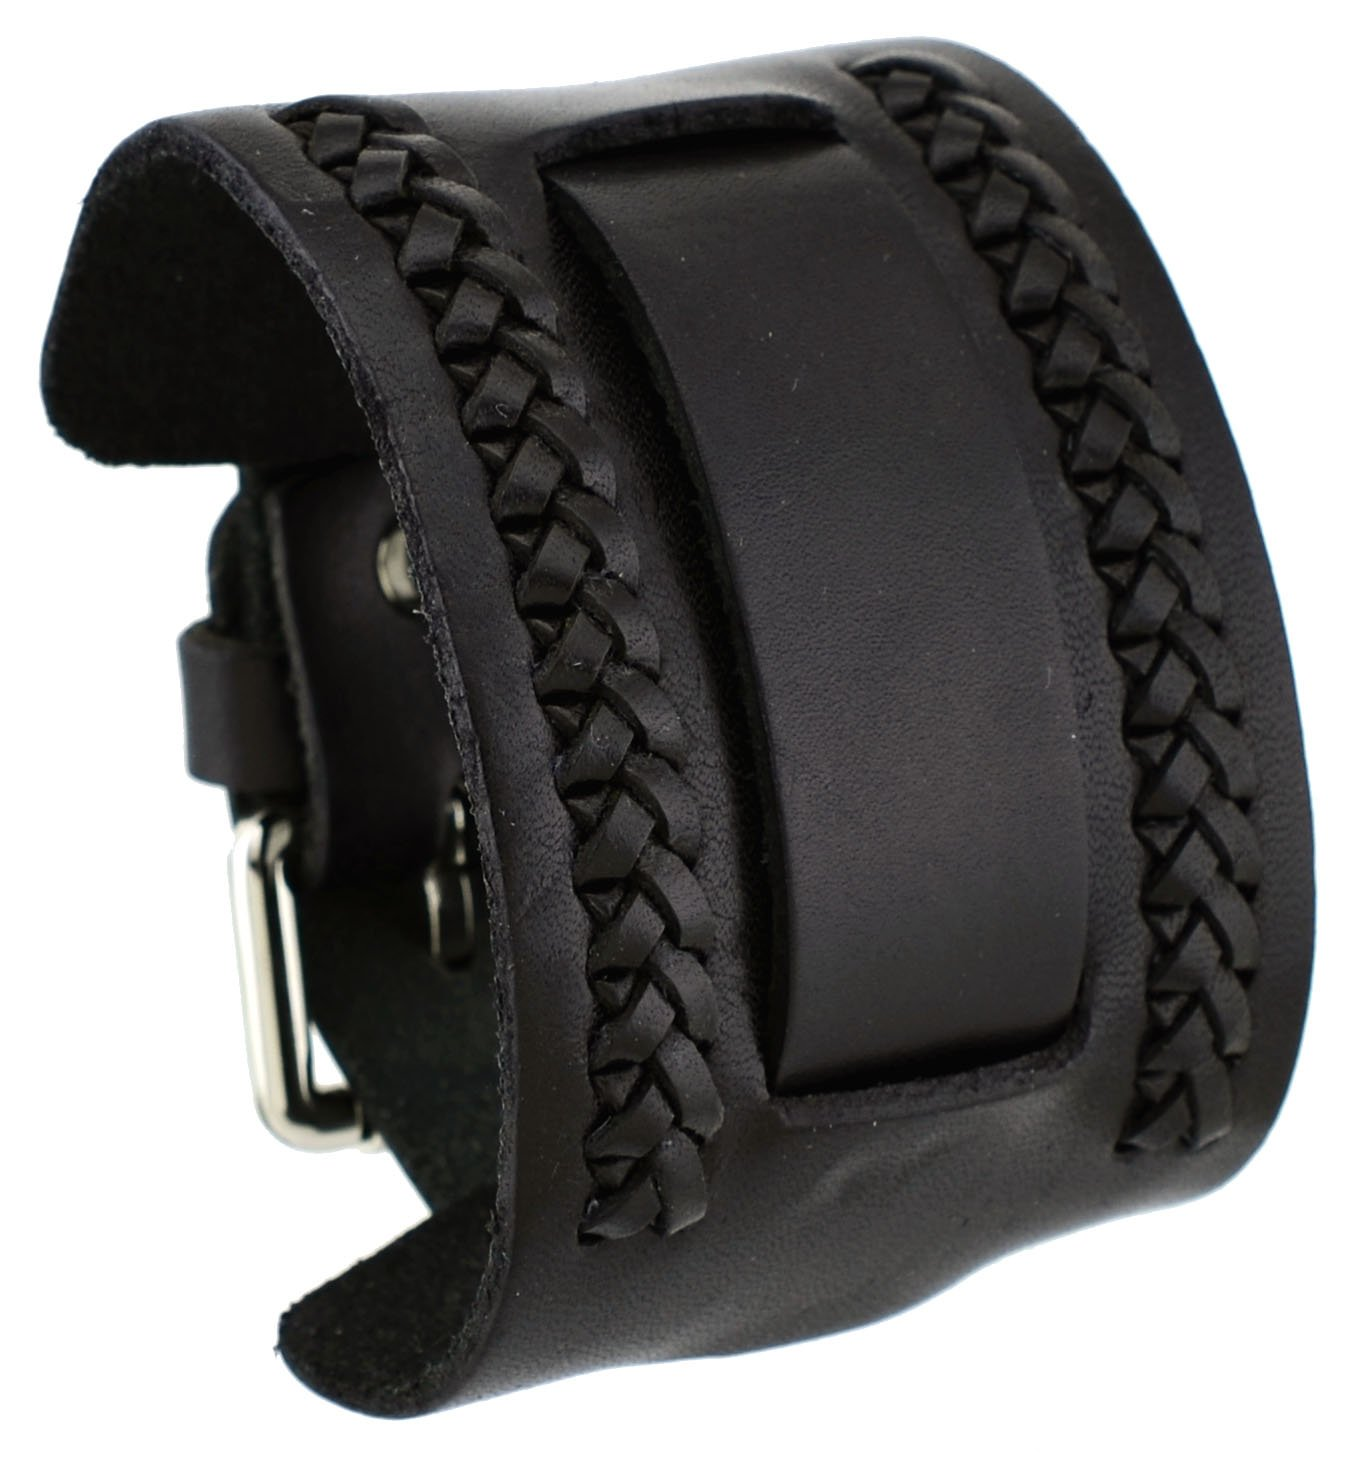 Nemesis NW-K Black Wide Leather Cuff Wrist Watch Band